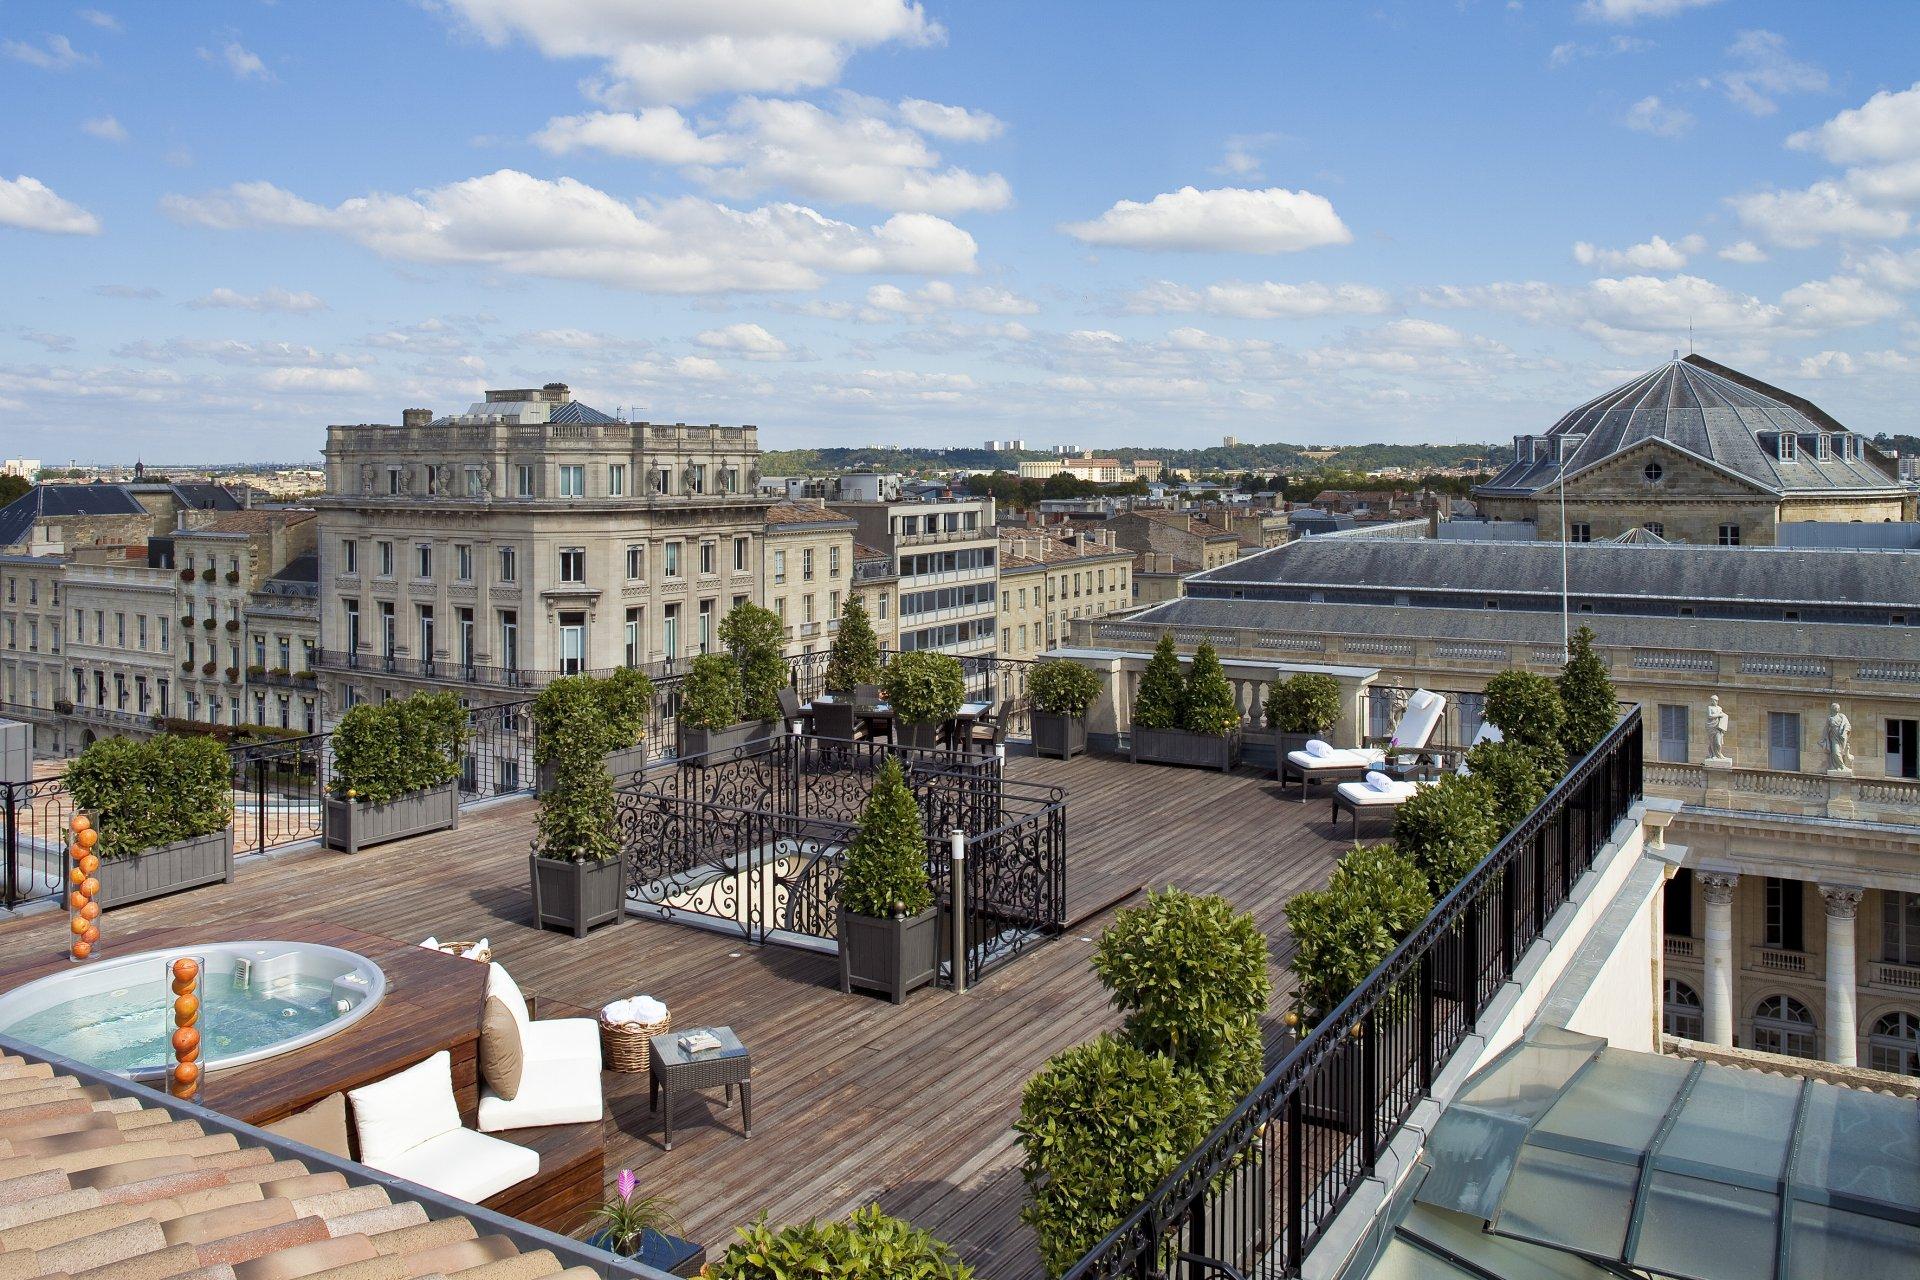 Intercontinental Bordeaux Le Grand Hotel*****